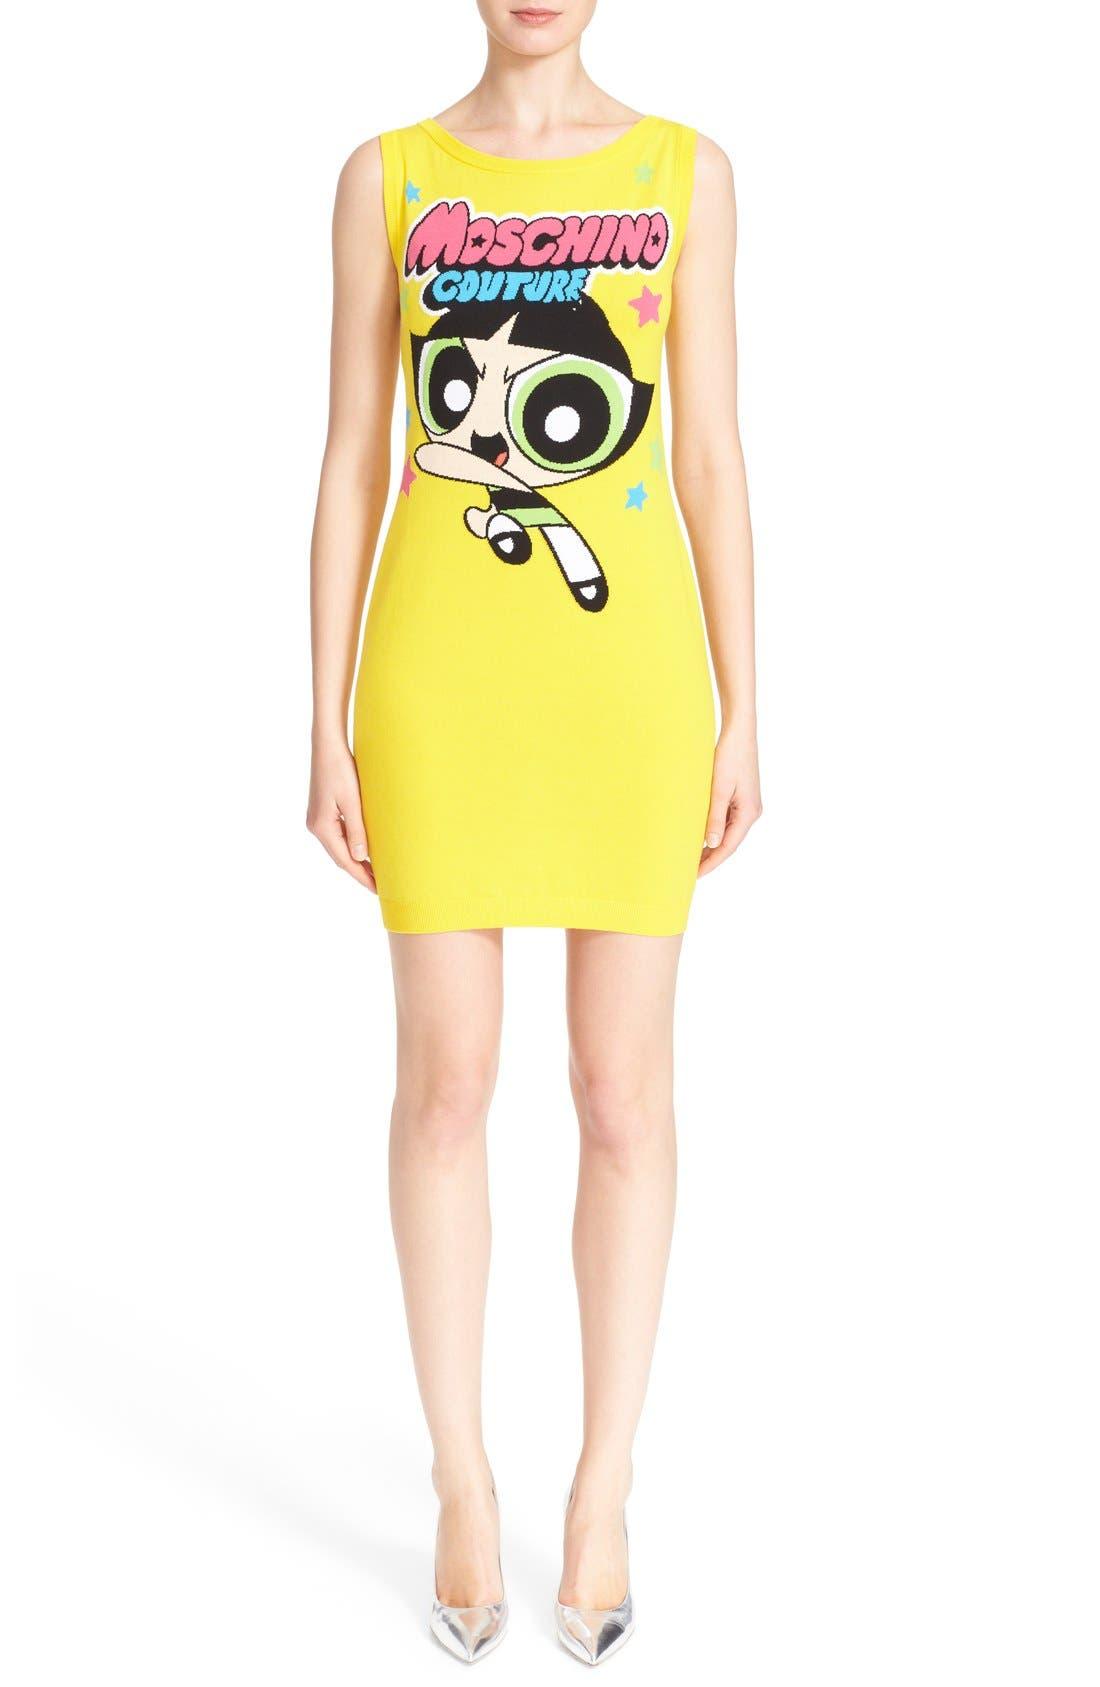 Alternate Image 1  - Moschino 'The Powerpuff Girls® - Buttercup' Intarsia Knit Dress